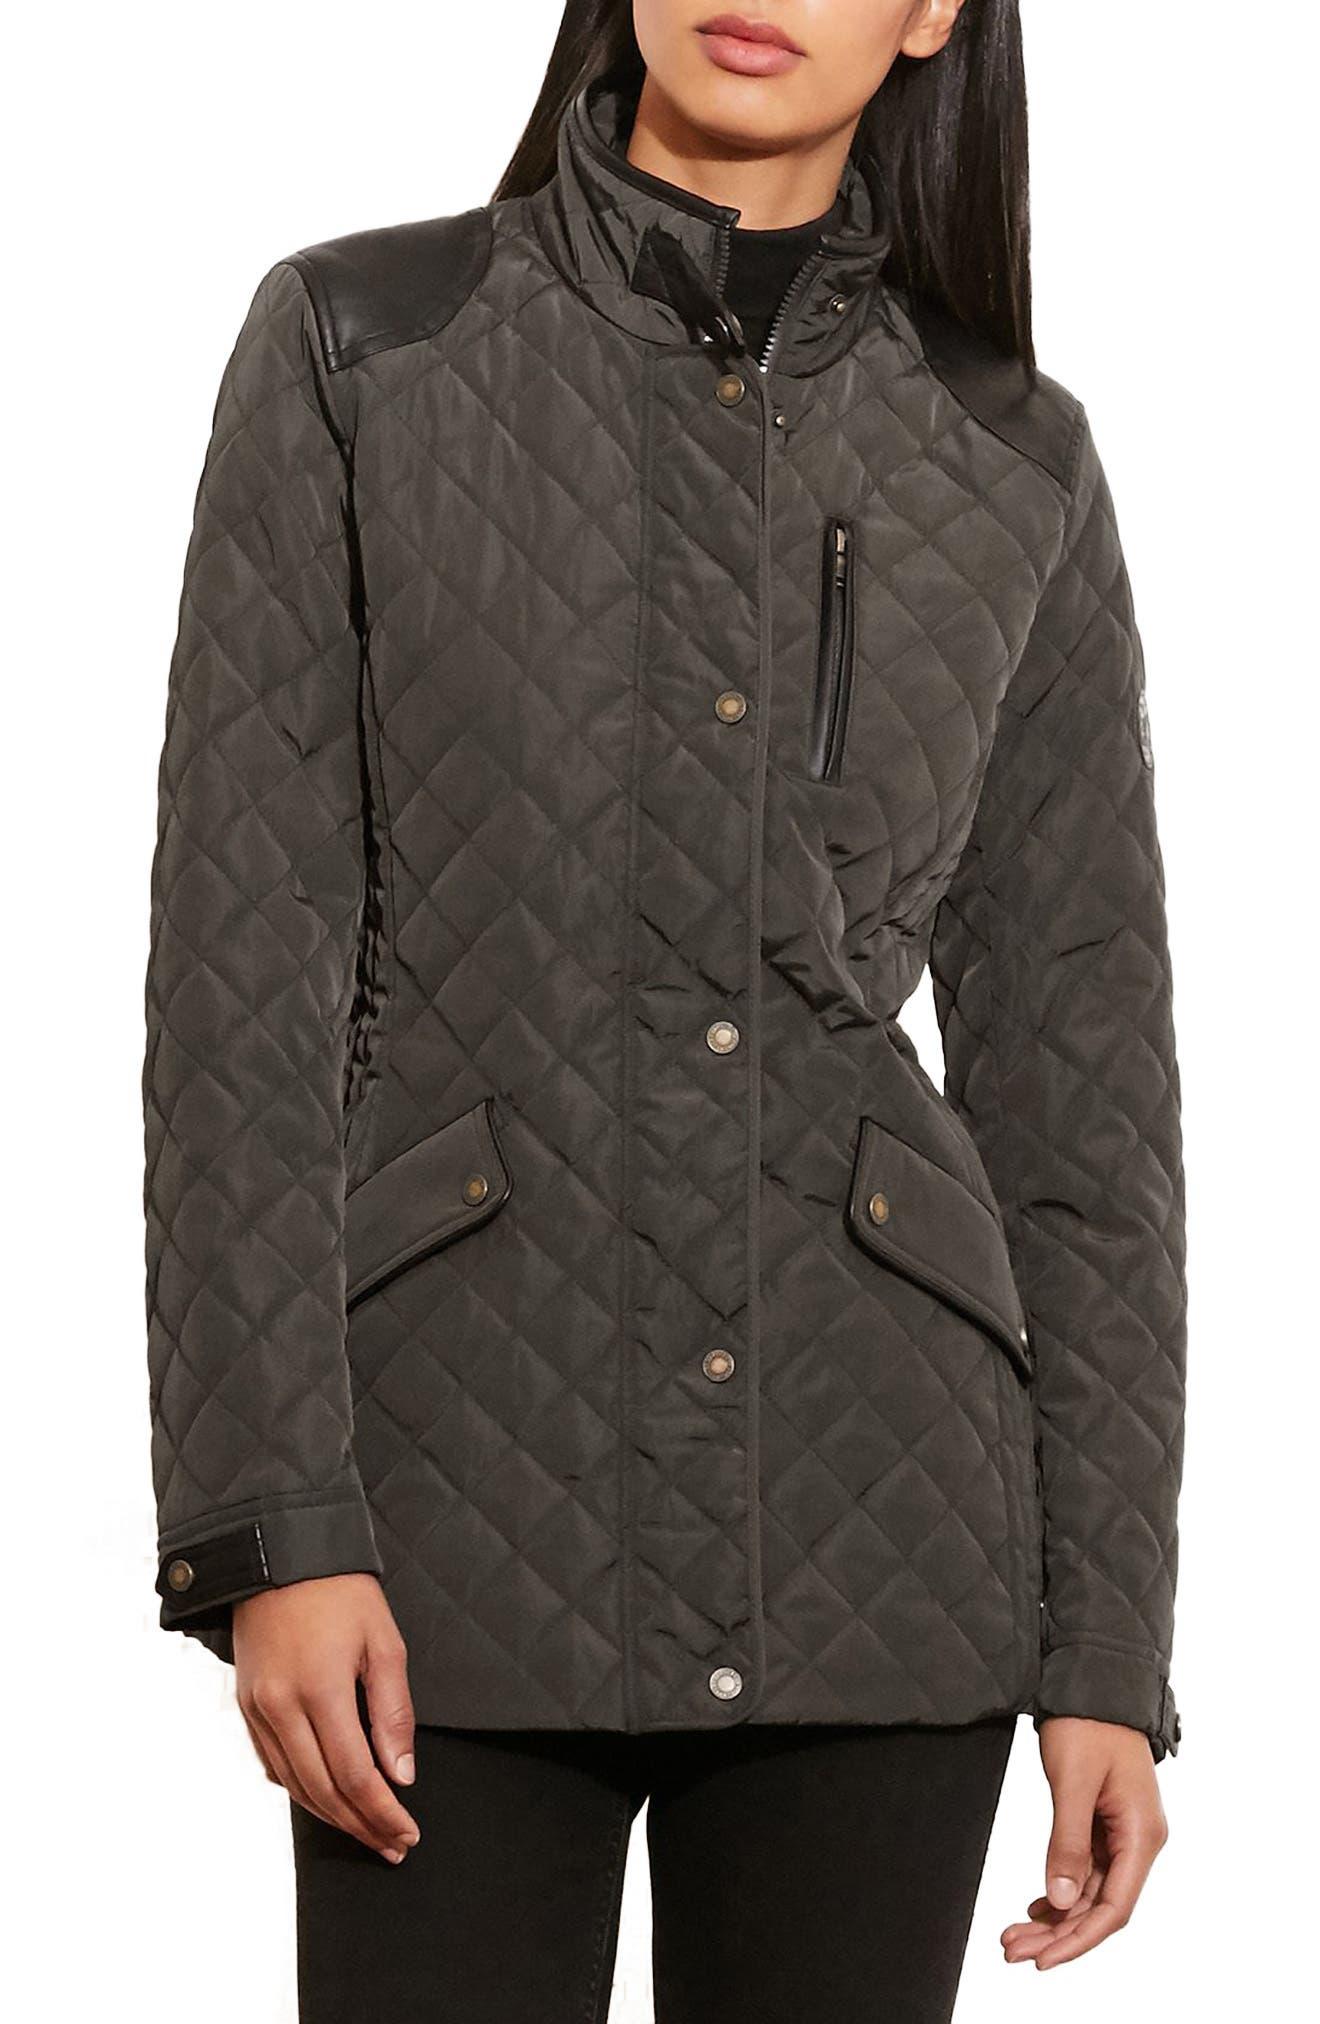 canada goose jacket tk maxx